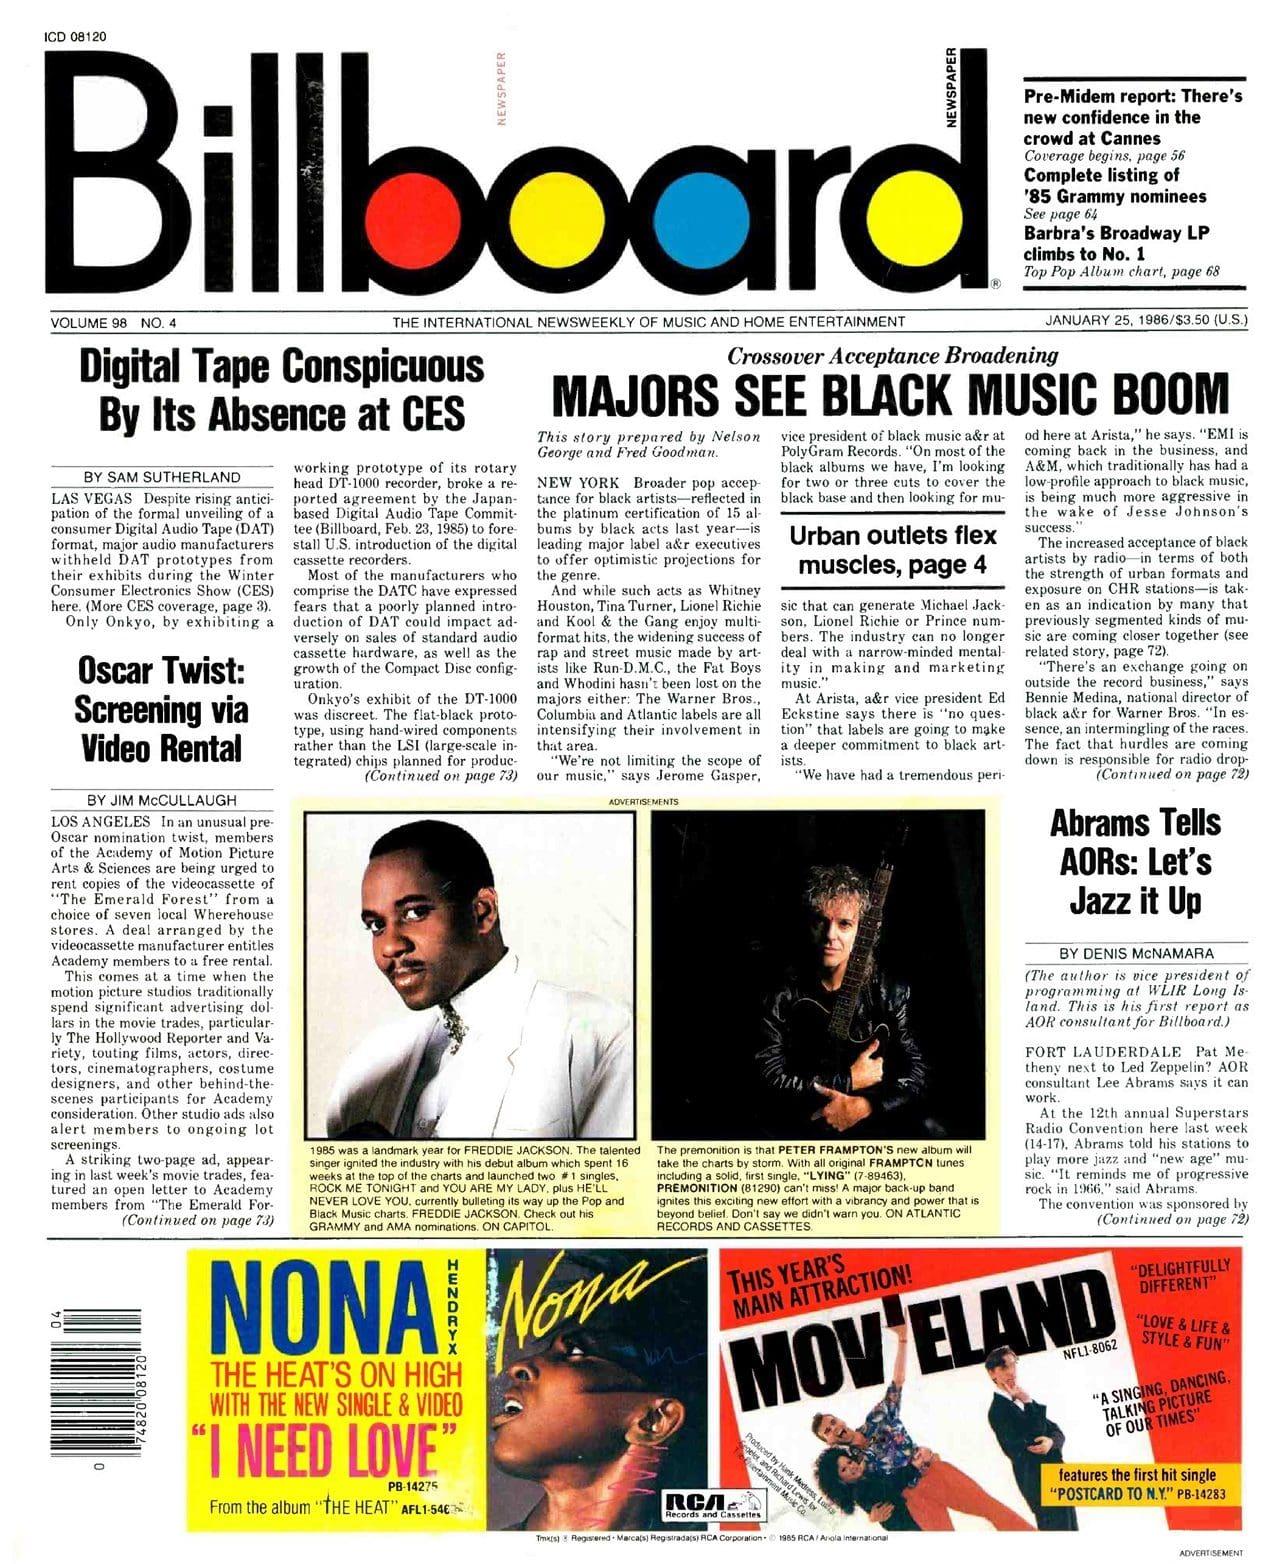 Ultimate Eurythmics Archives : Dave Stewart - Billboard Magazine